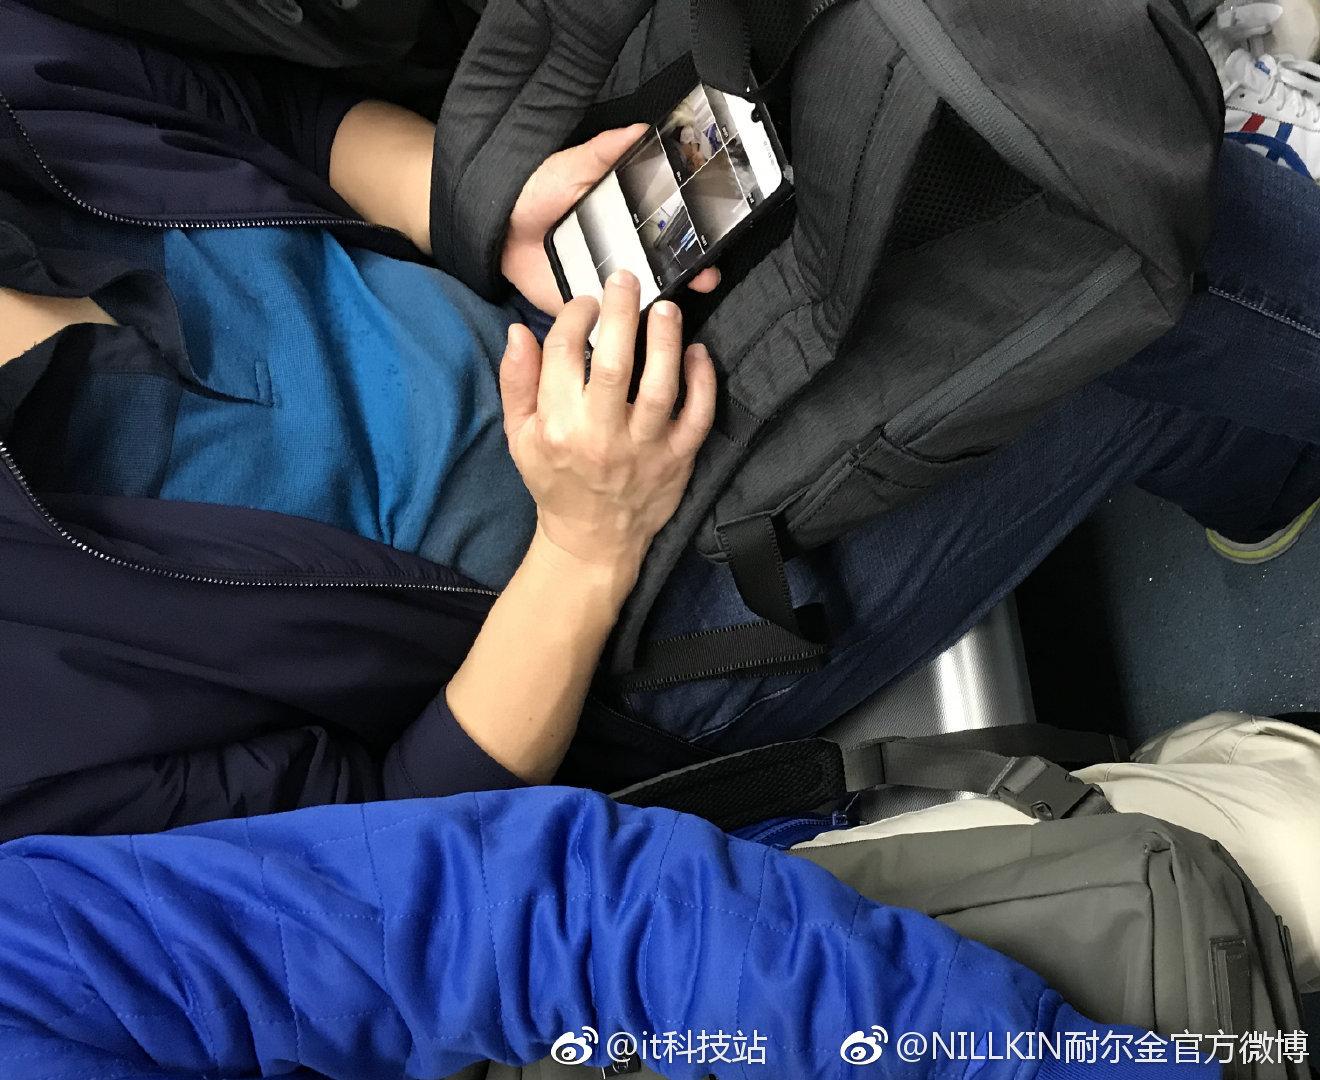 Huawei P30 PRO real imagine